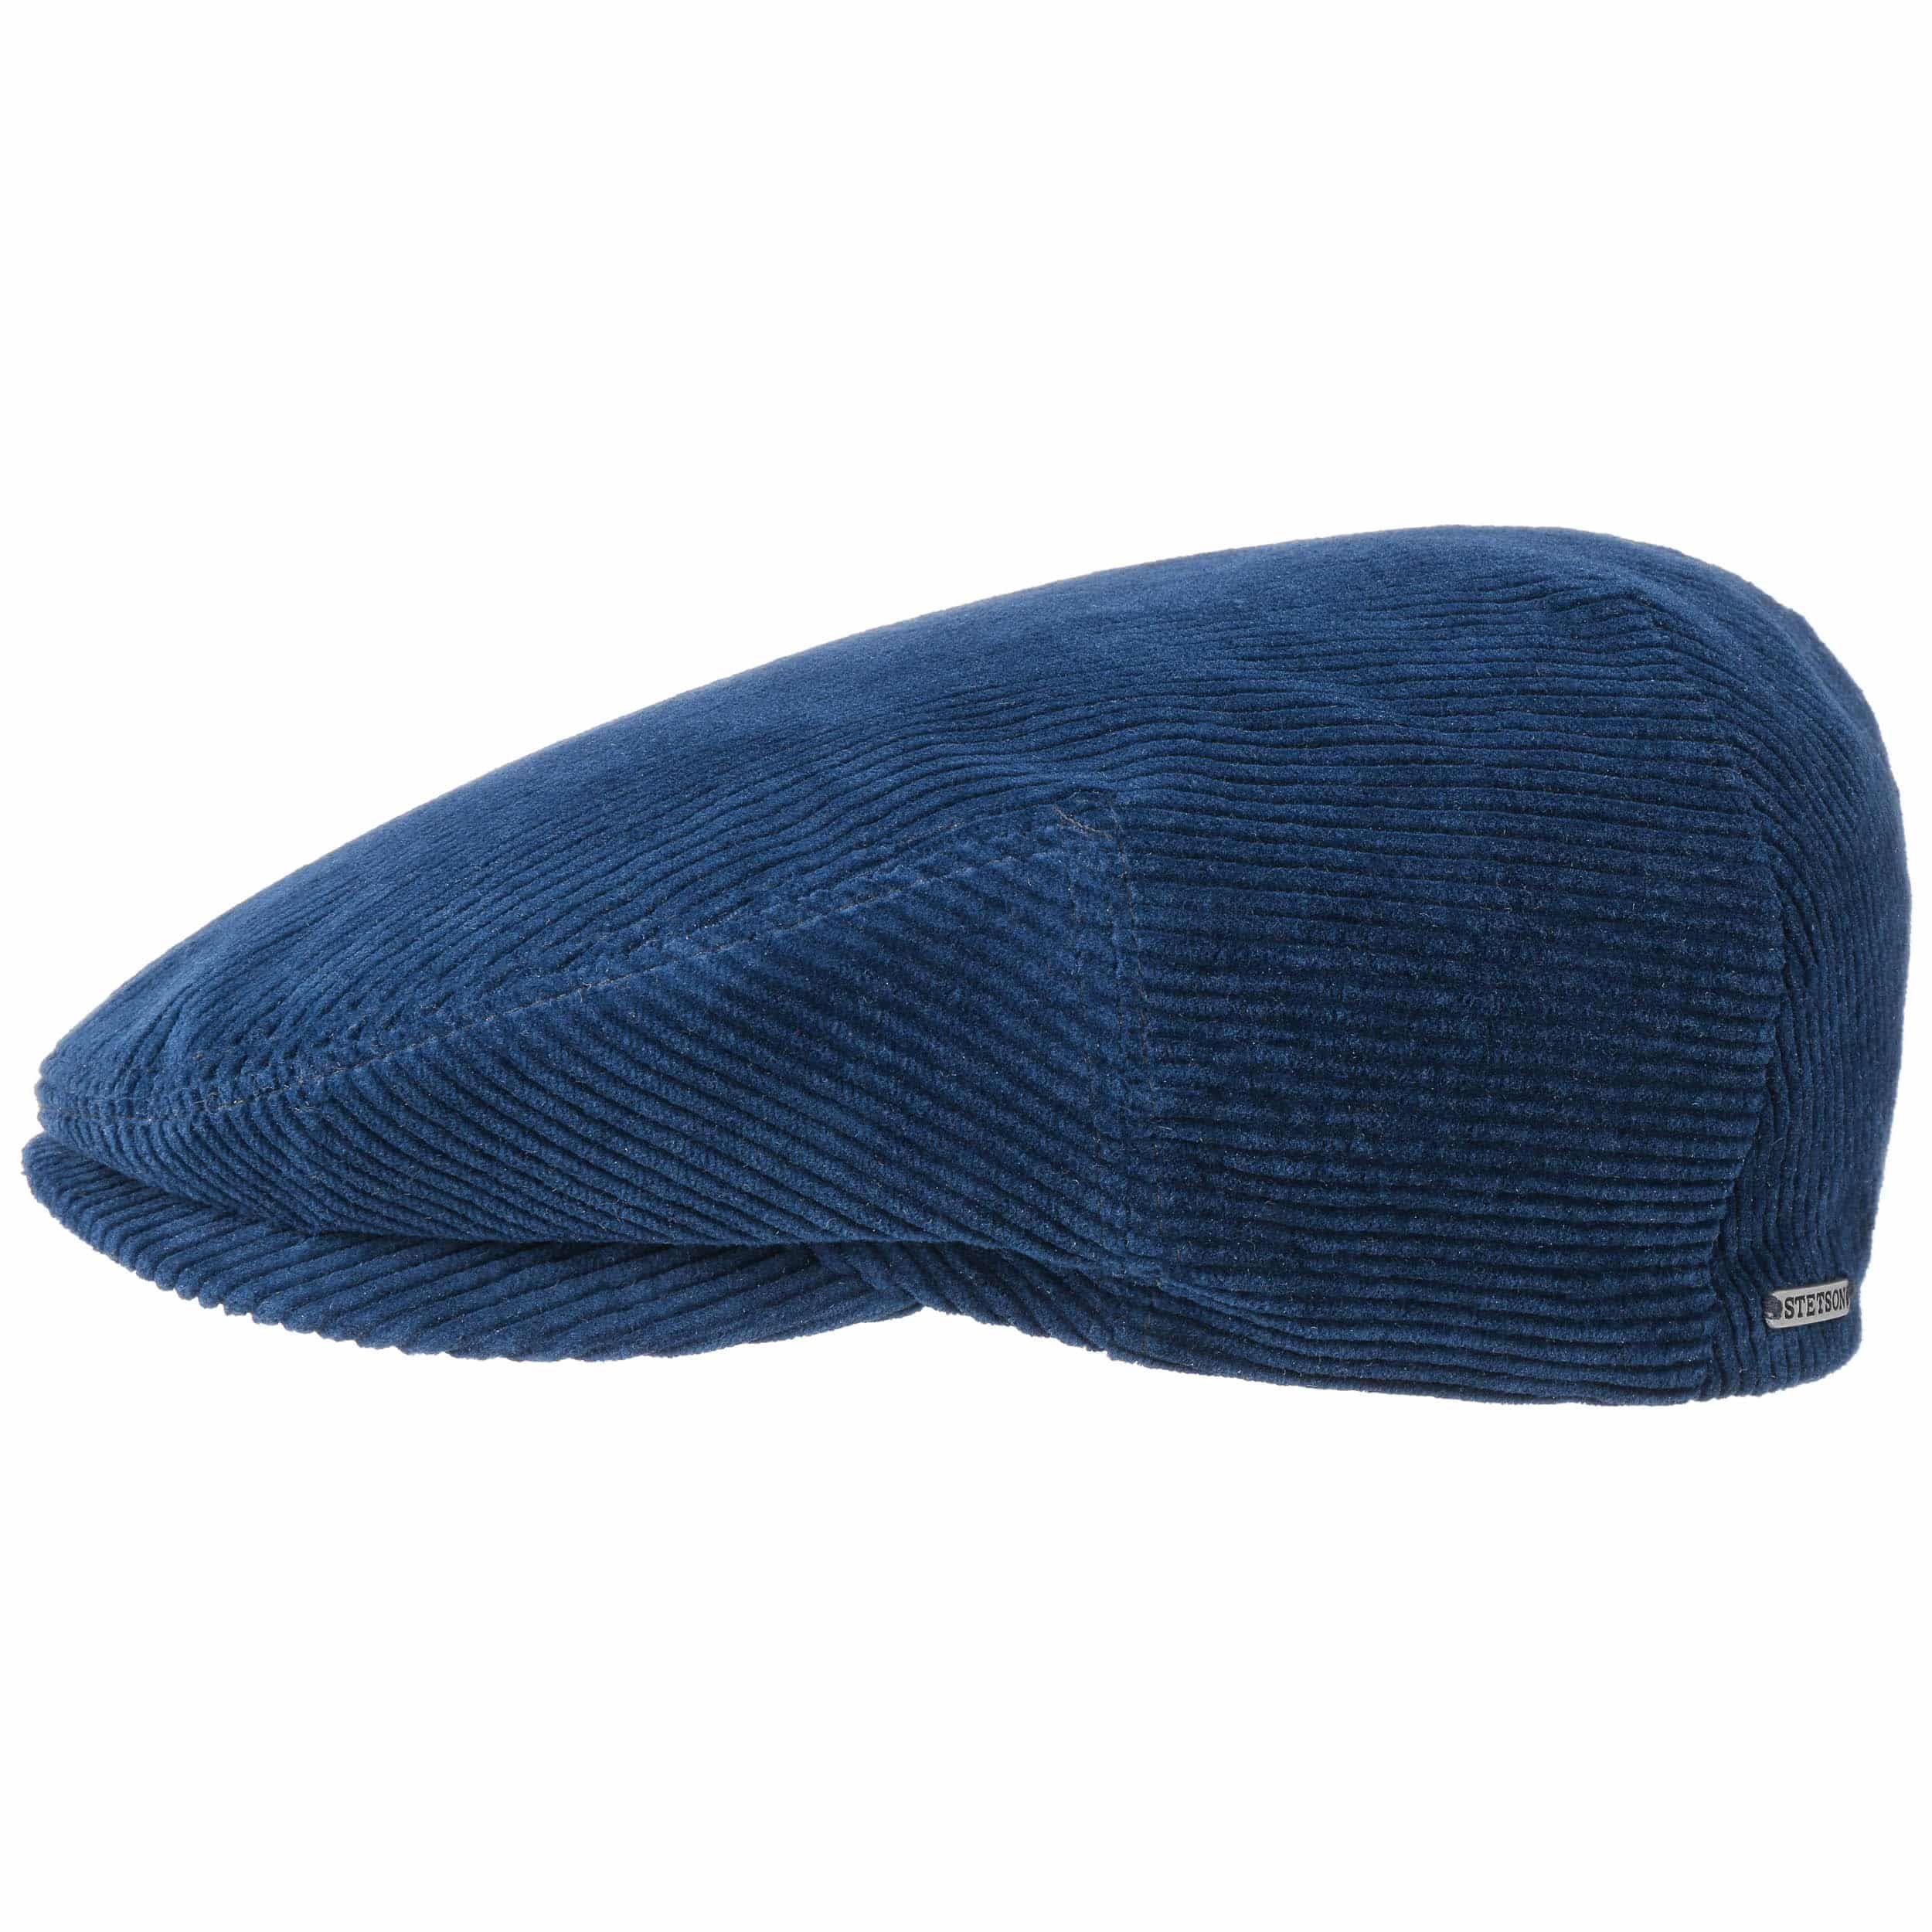 Kent Cord Classic Flatcap blau